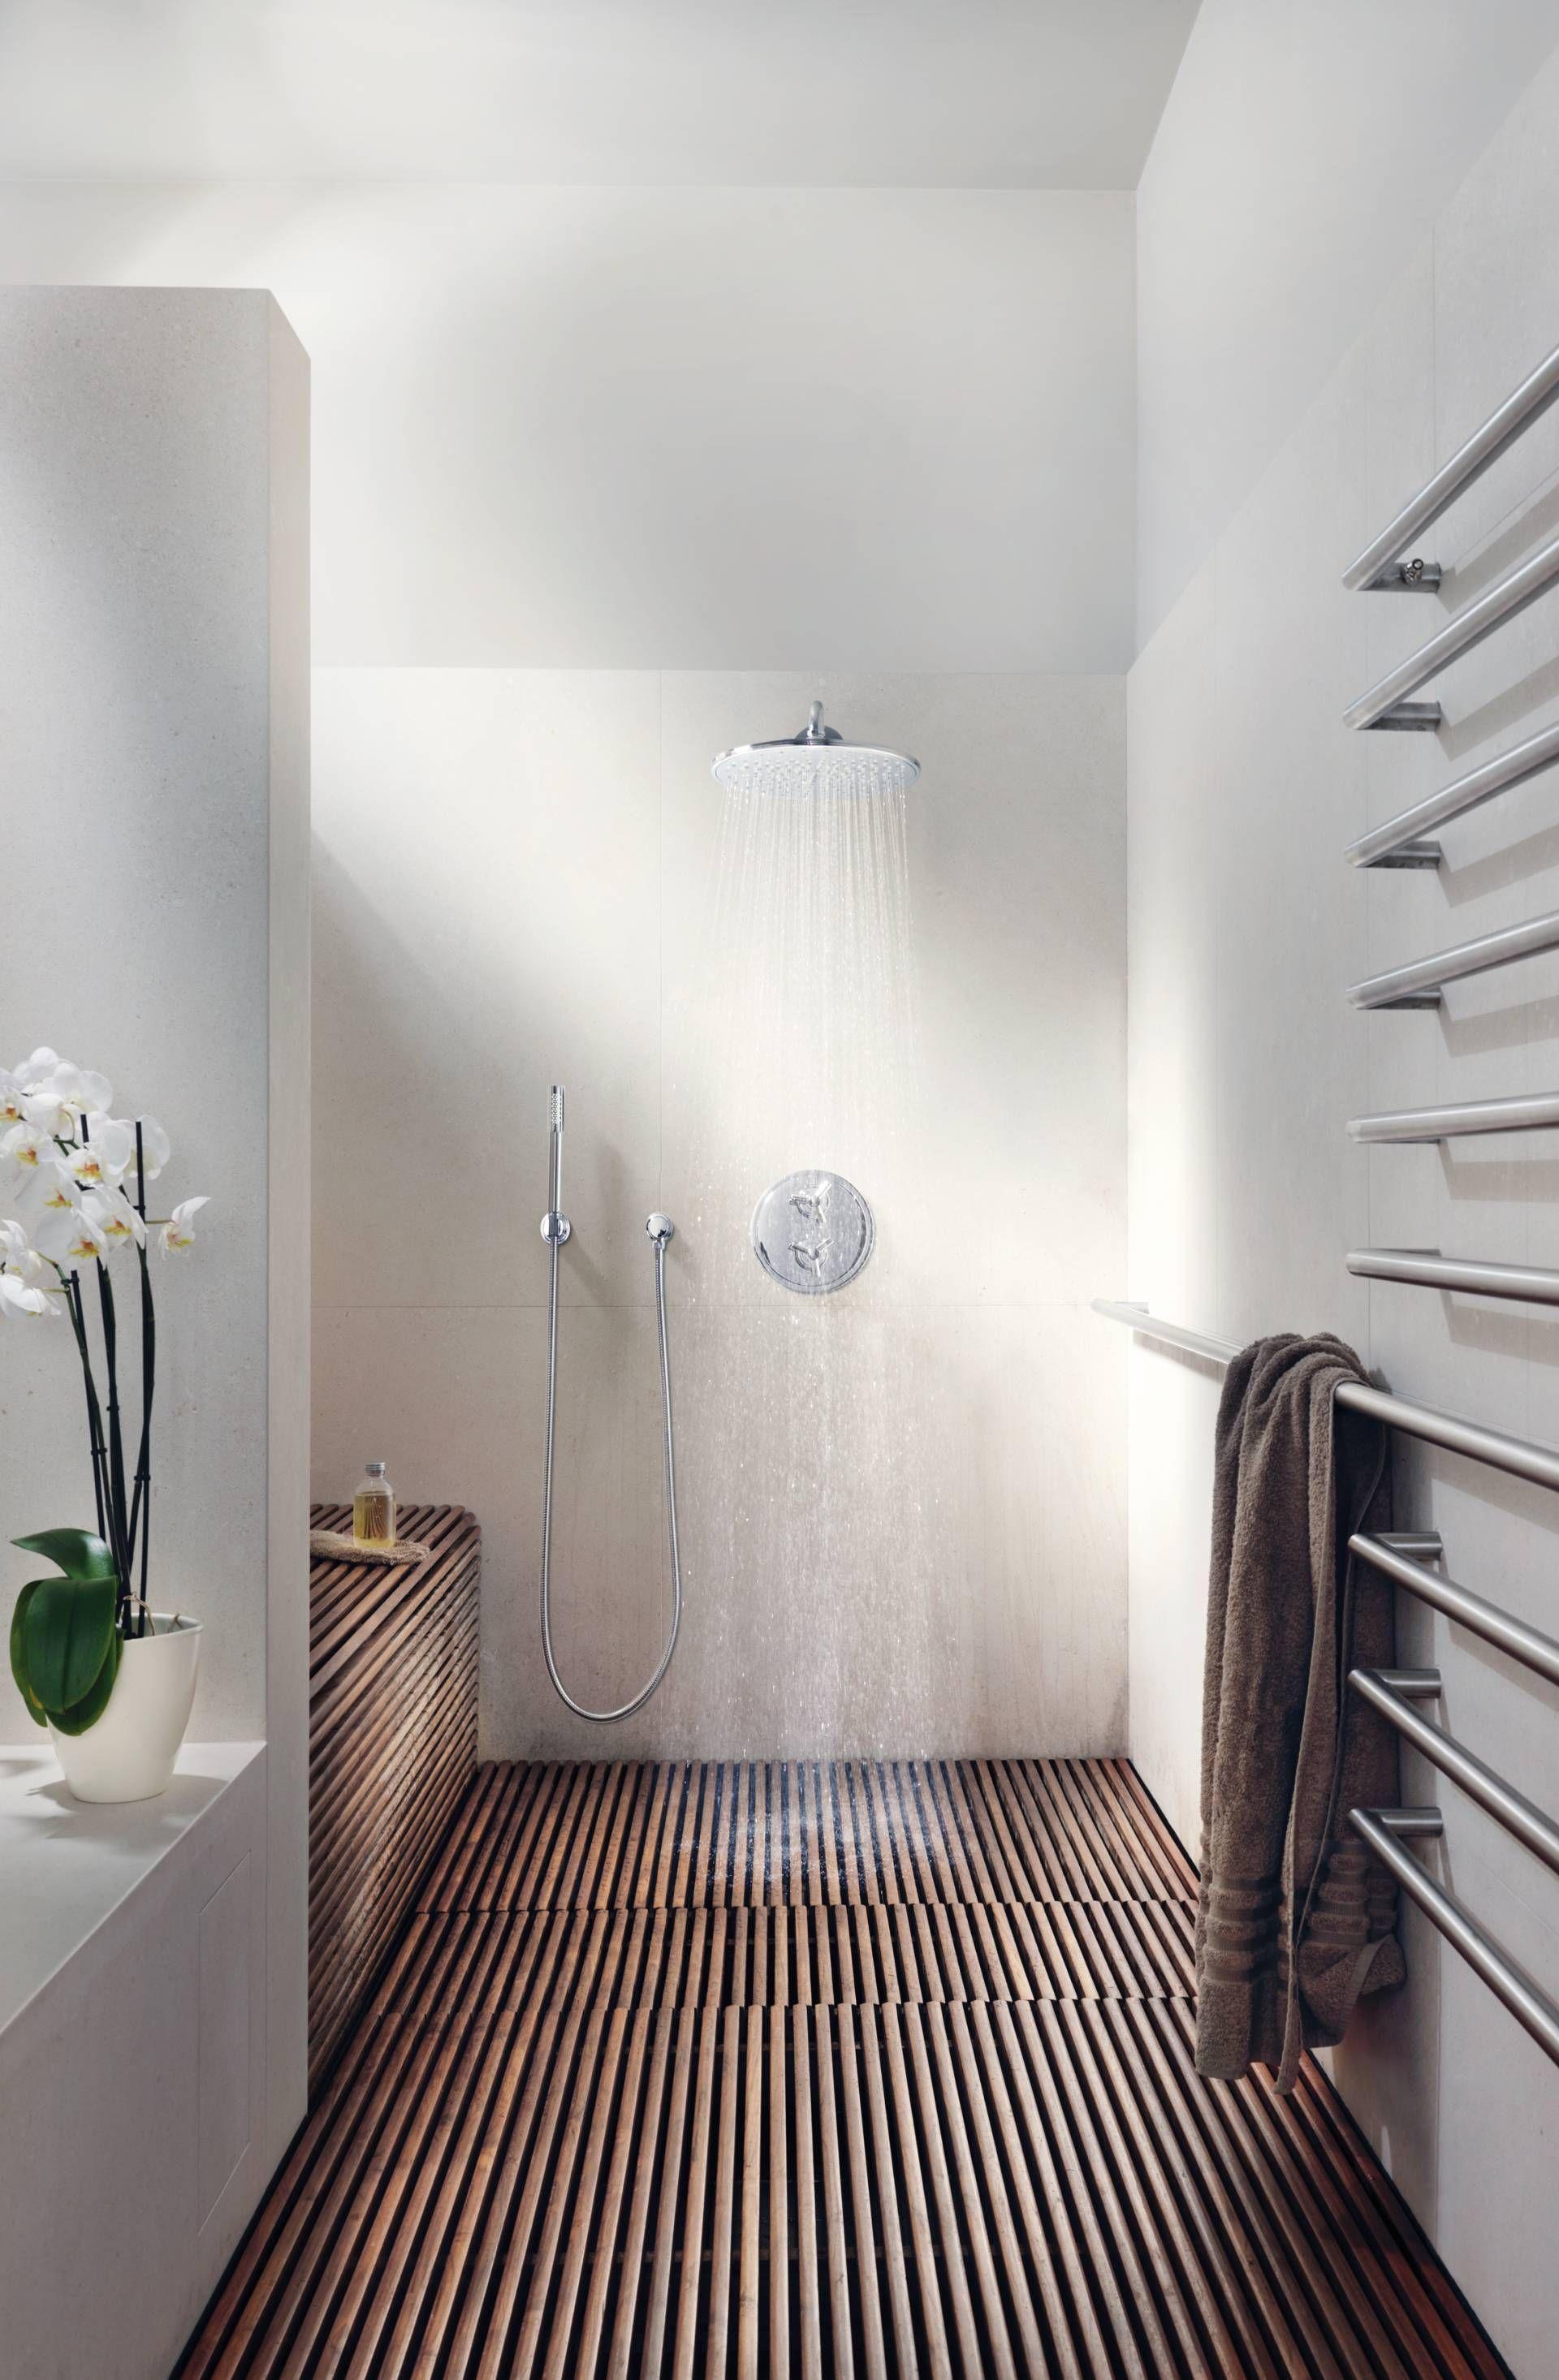 Wood Slat Shower Floors Are Heavily Inspired By Scandinavian Or